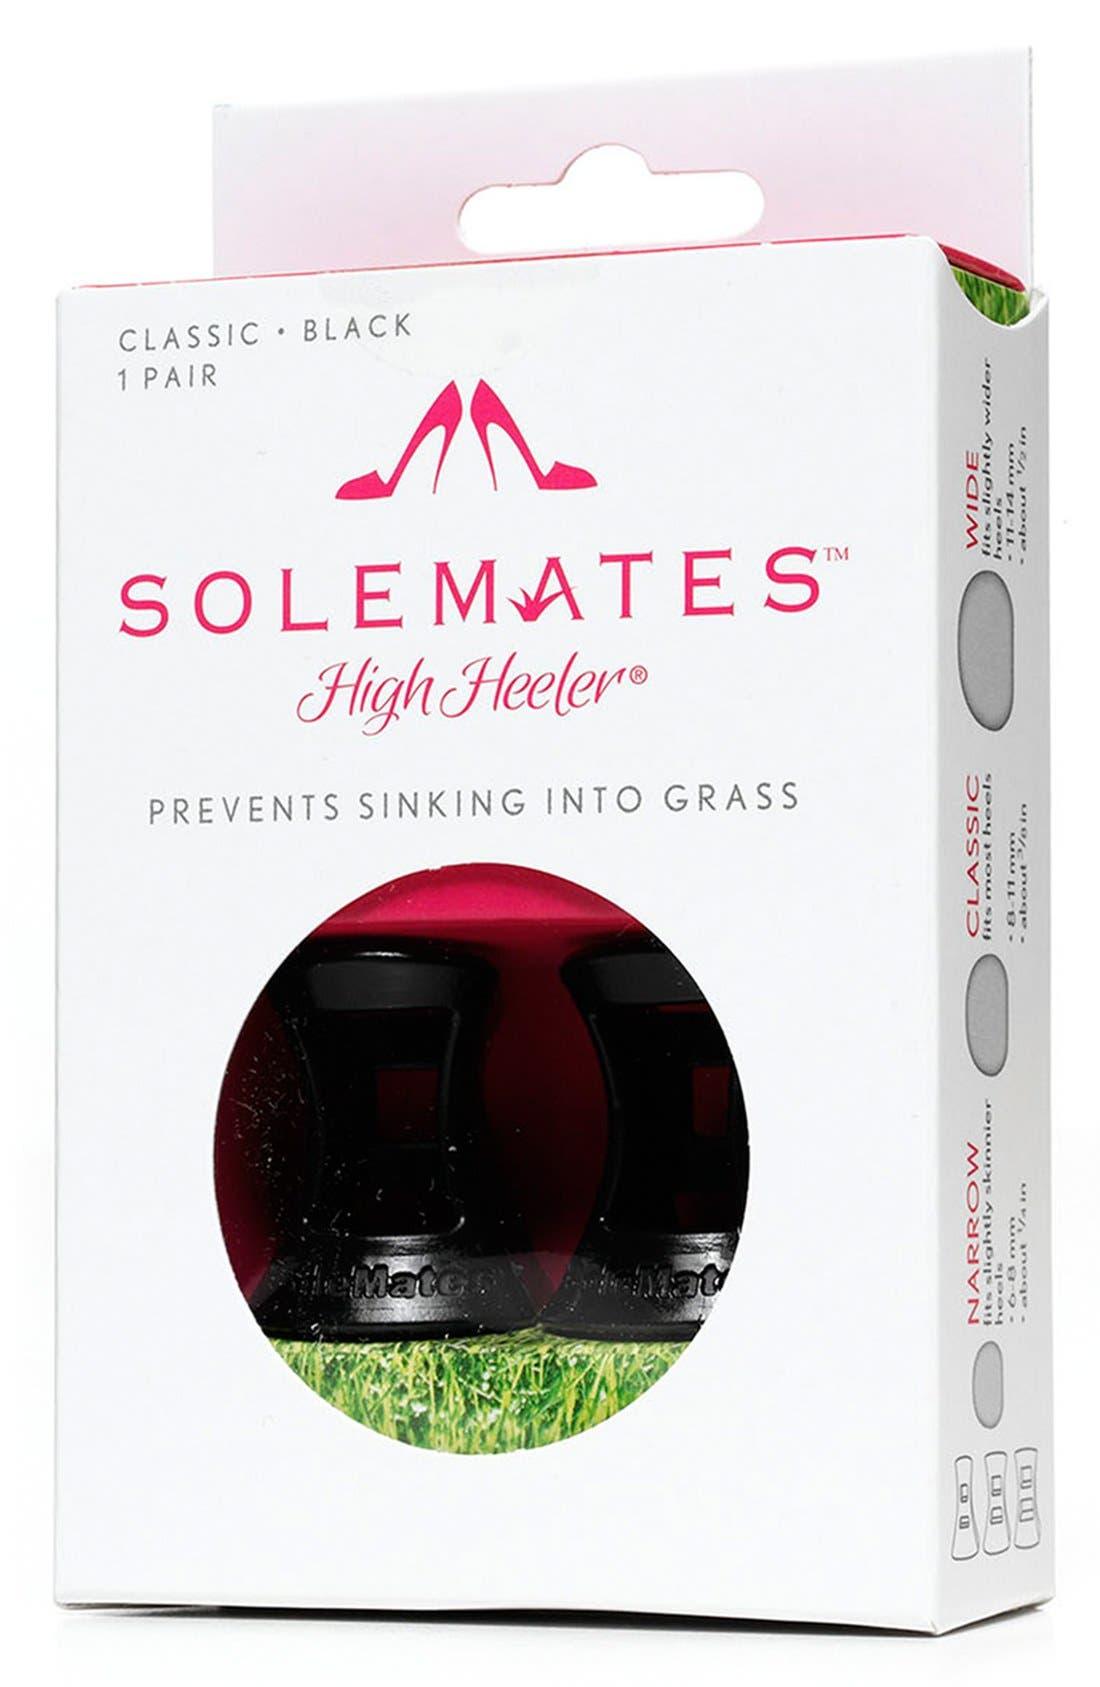 Solemates 'High Heeler' Heel Protectors,                             Alternate thumbnail 3, color,                             BLACK